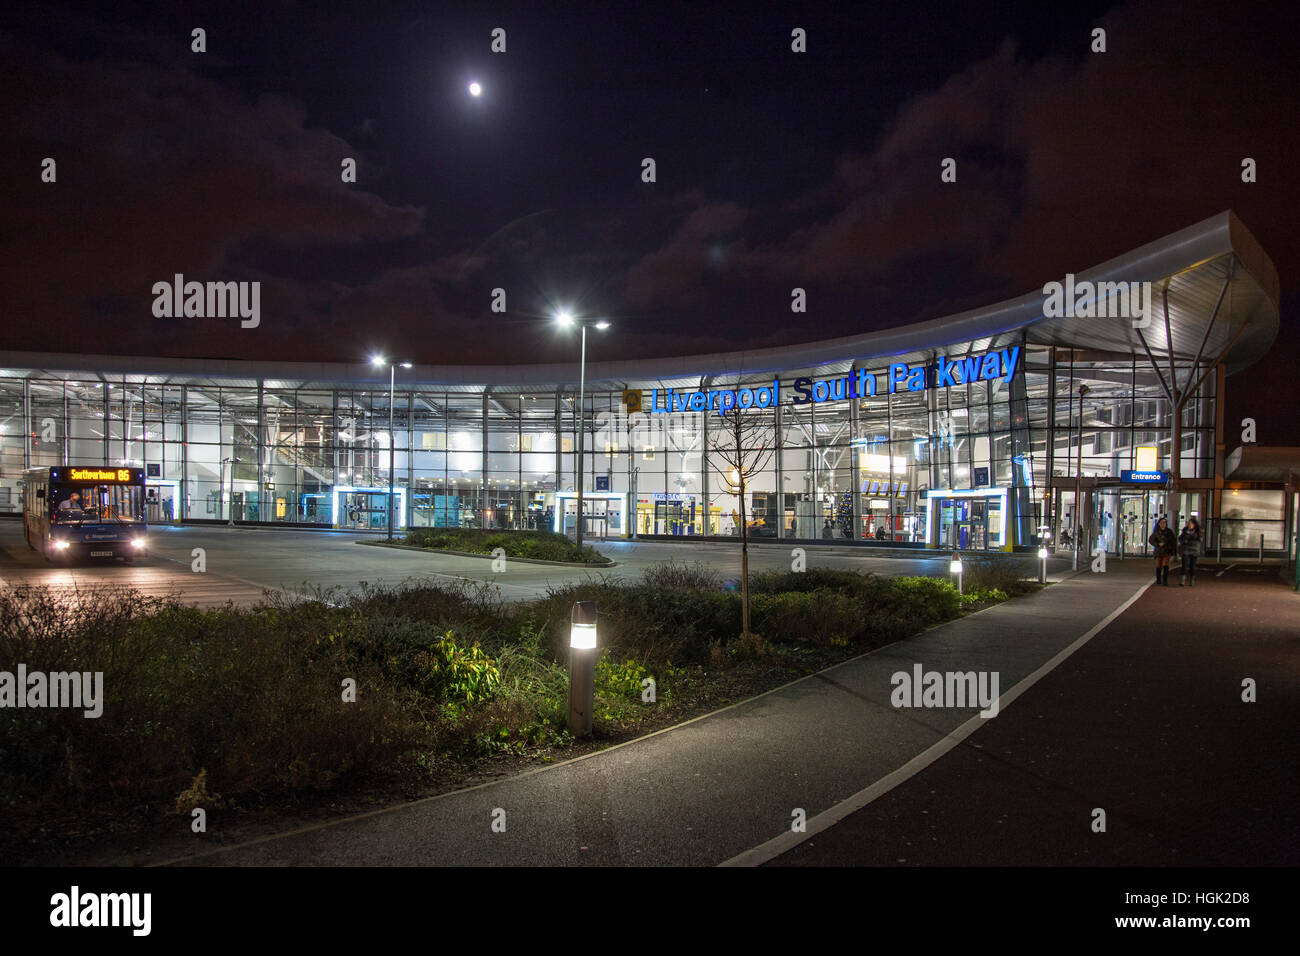 Liverpool South Parkway bus railway station interchange Garston. Merseyside. Airport link. Nightime Night - Stock Image